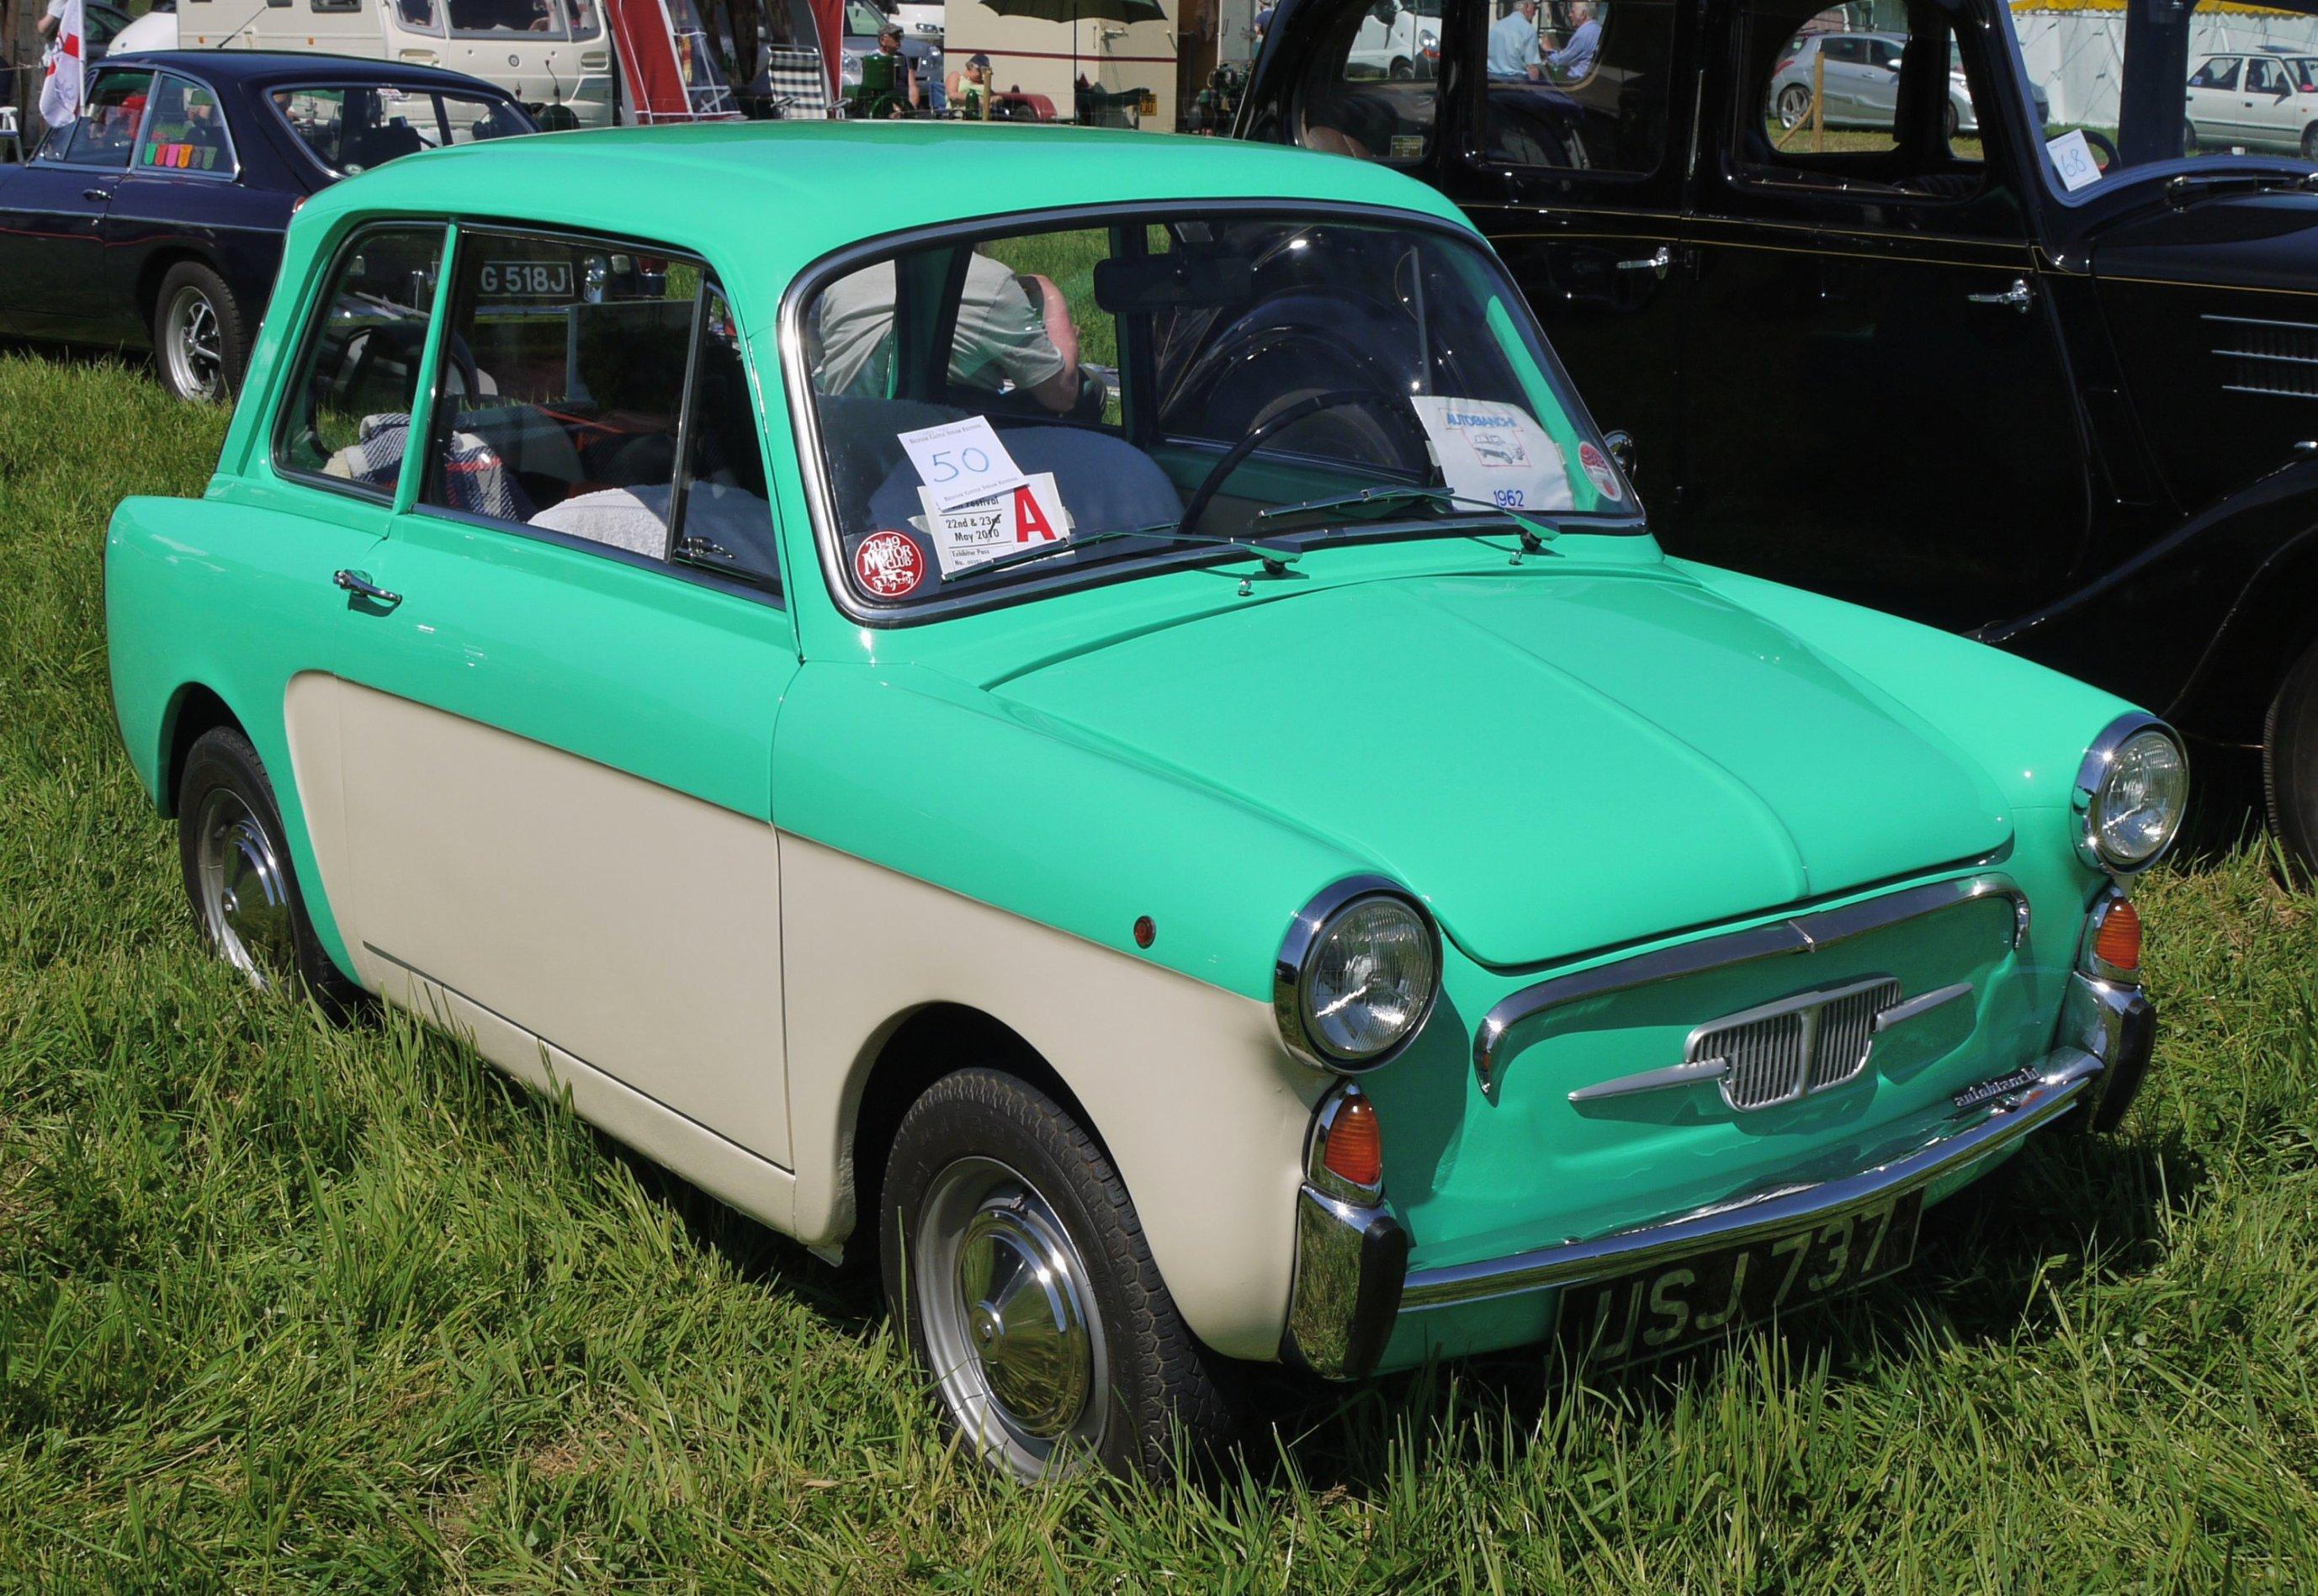 Autobianchi_Berlina_1962_(front)_-_Flickr_-_mick_-_Lumix.jpg